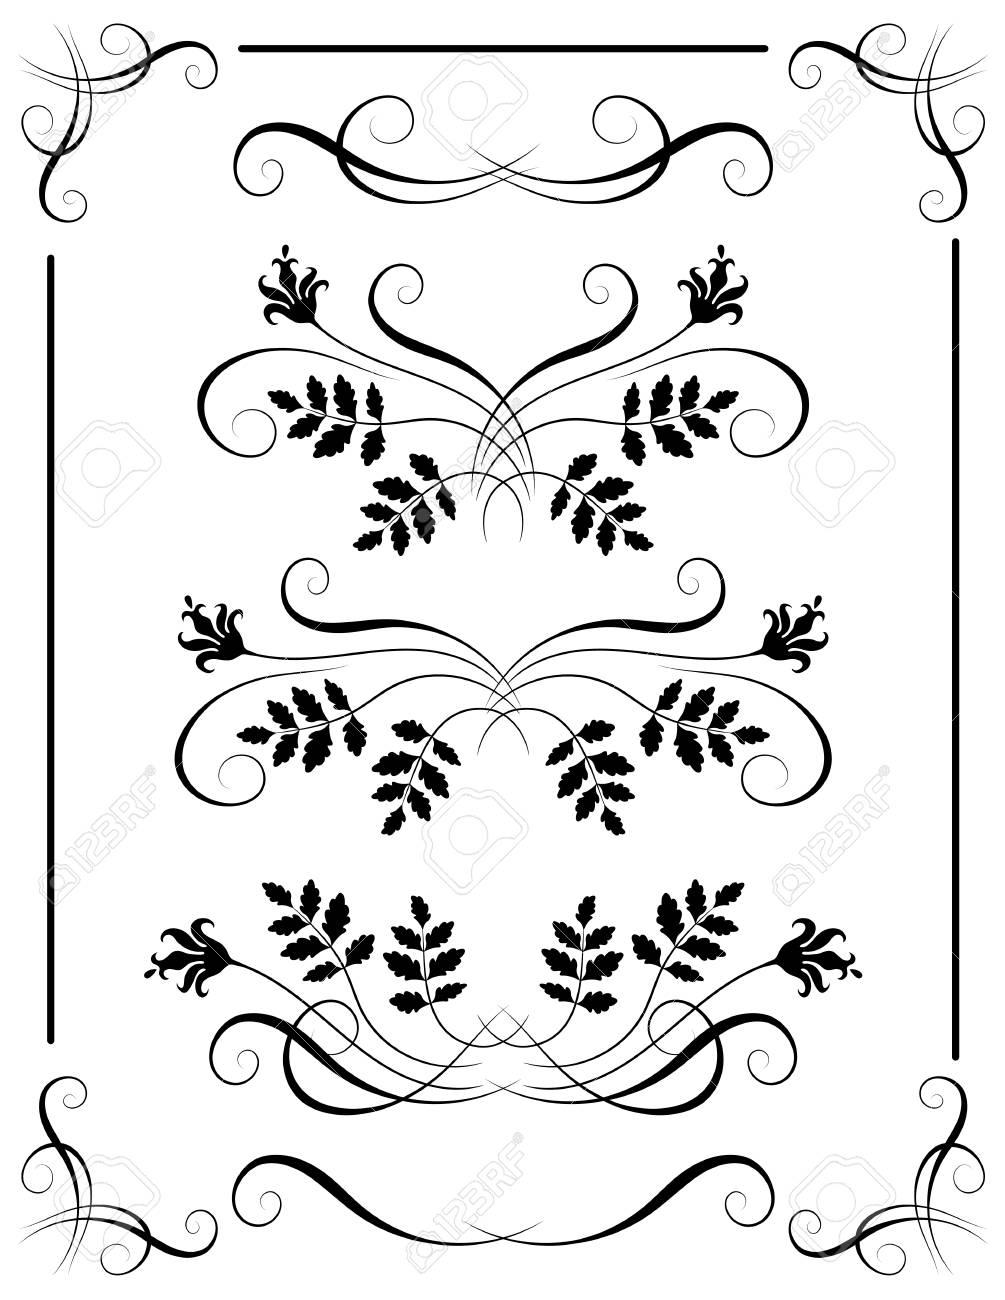 set vintage ornament and decorative divider for greeting card